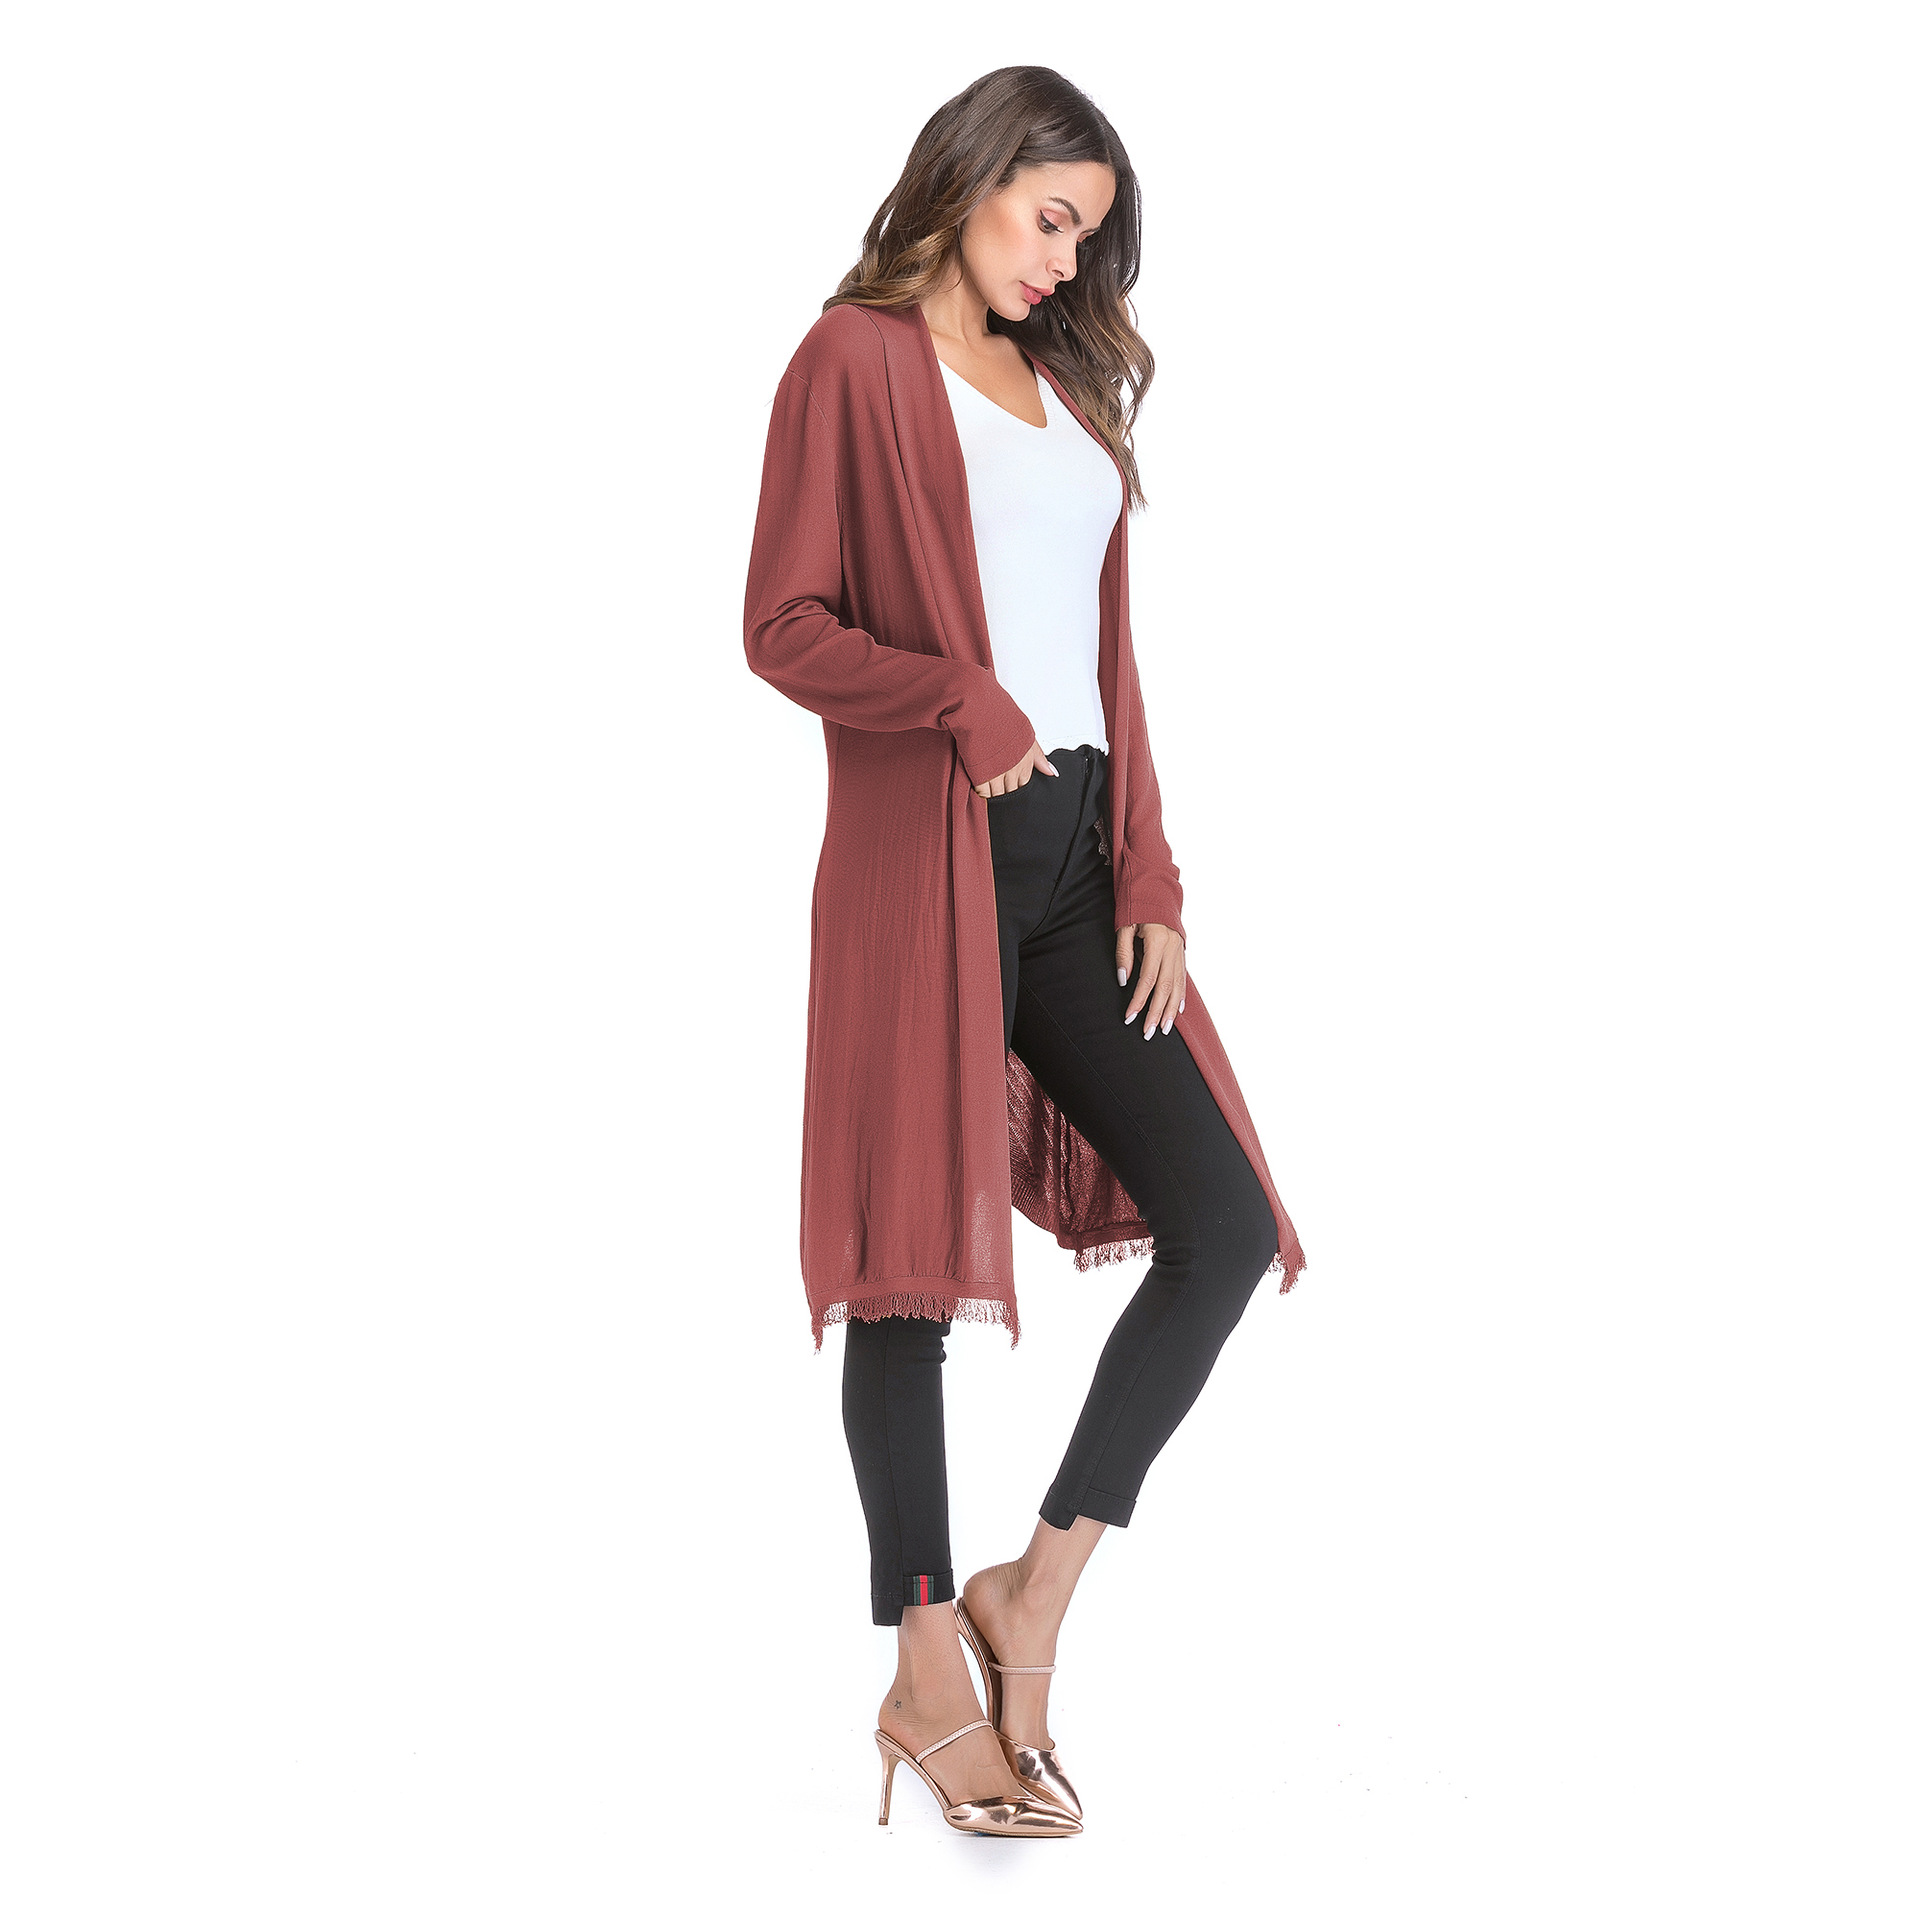 8b0f0eb90ed 2019 Long Cardigan Women Summer Sweaters 2018 Fashion Fall Jacket ...